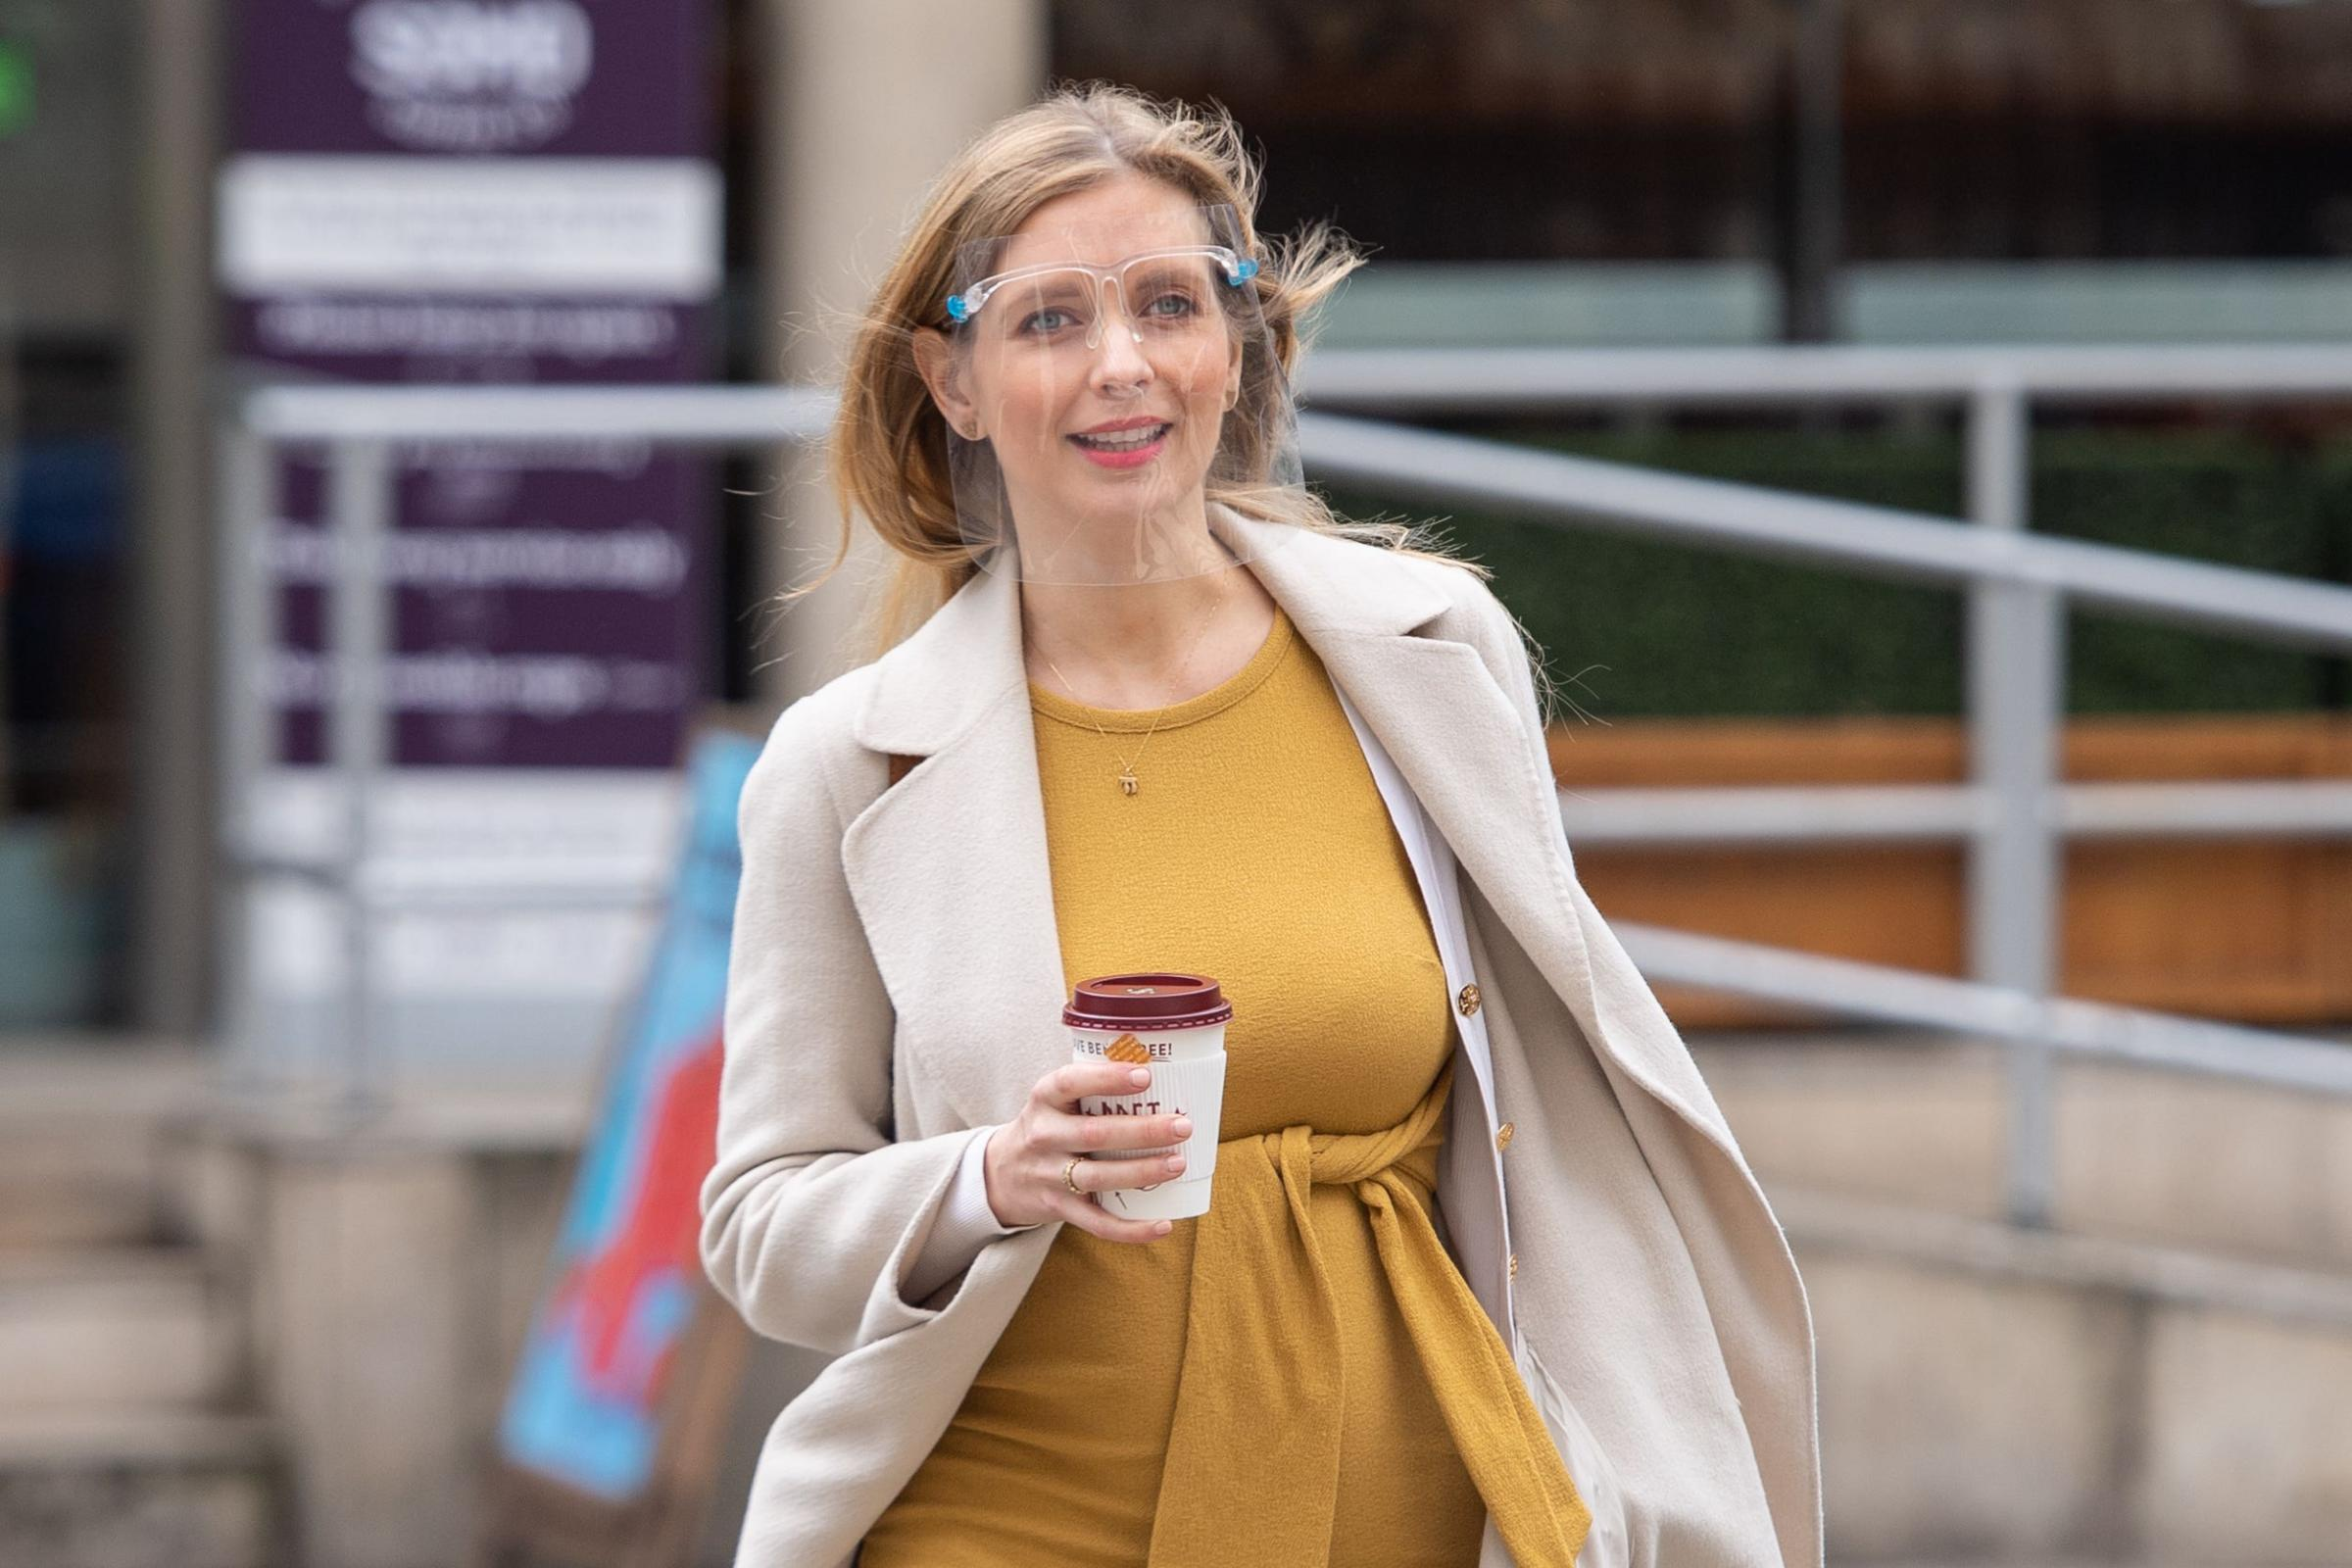 Rachel Riley's tweet was provocative, says Corbyn aide sued for libel